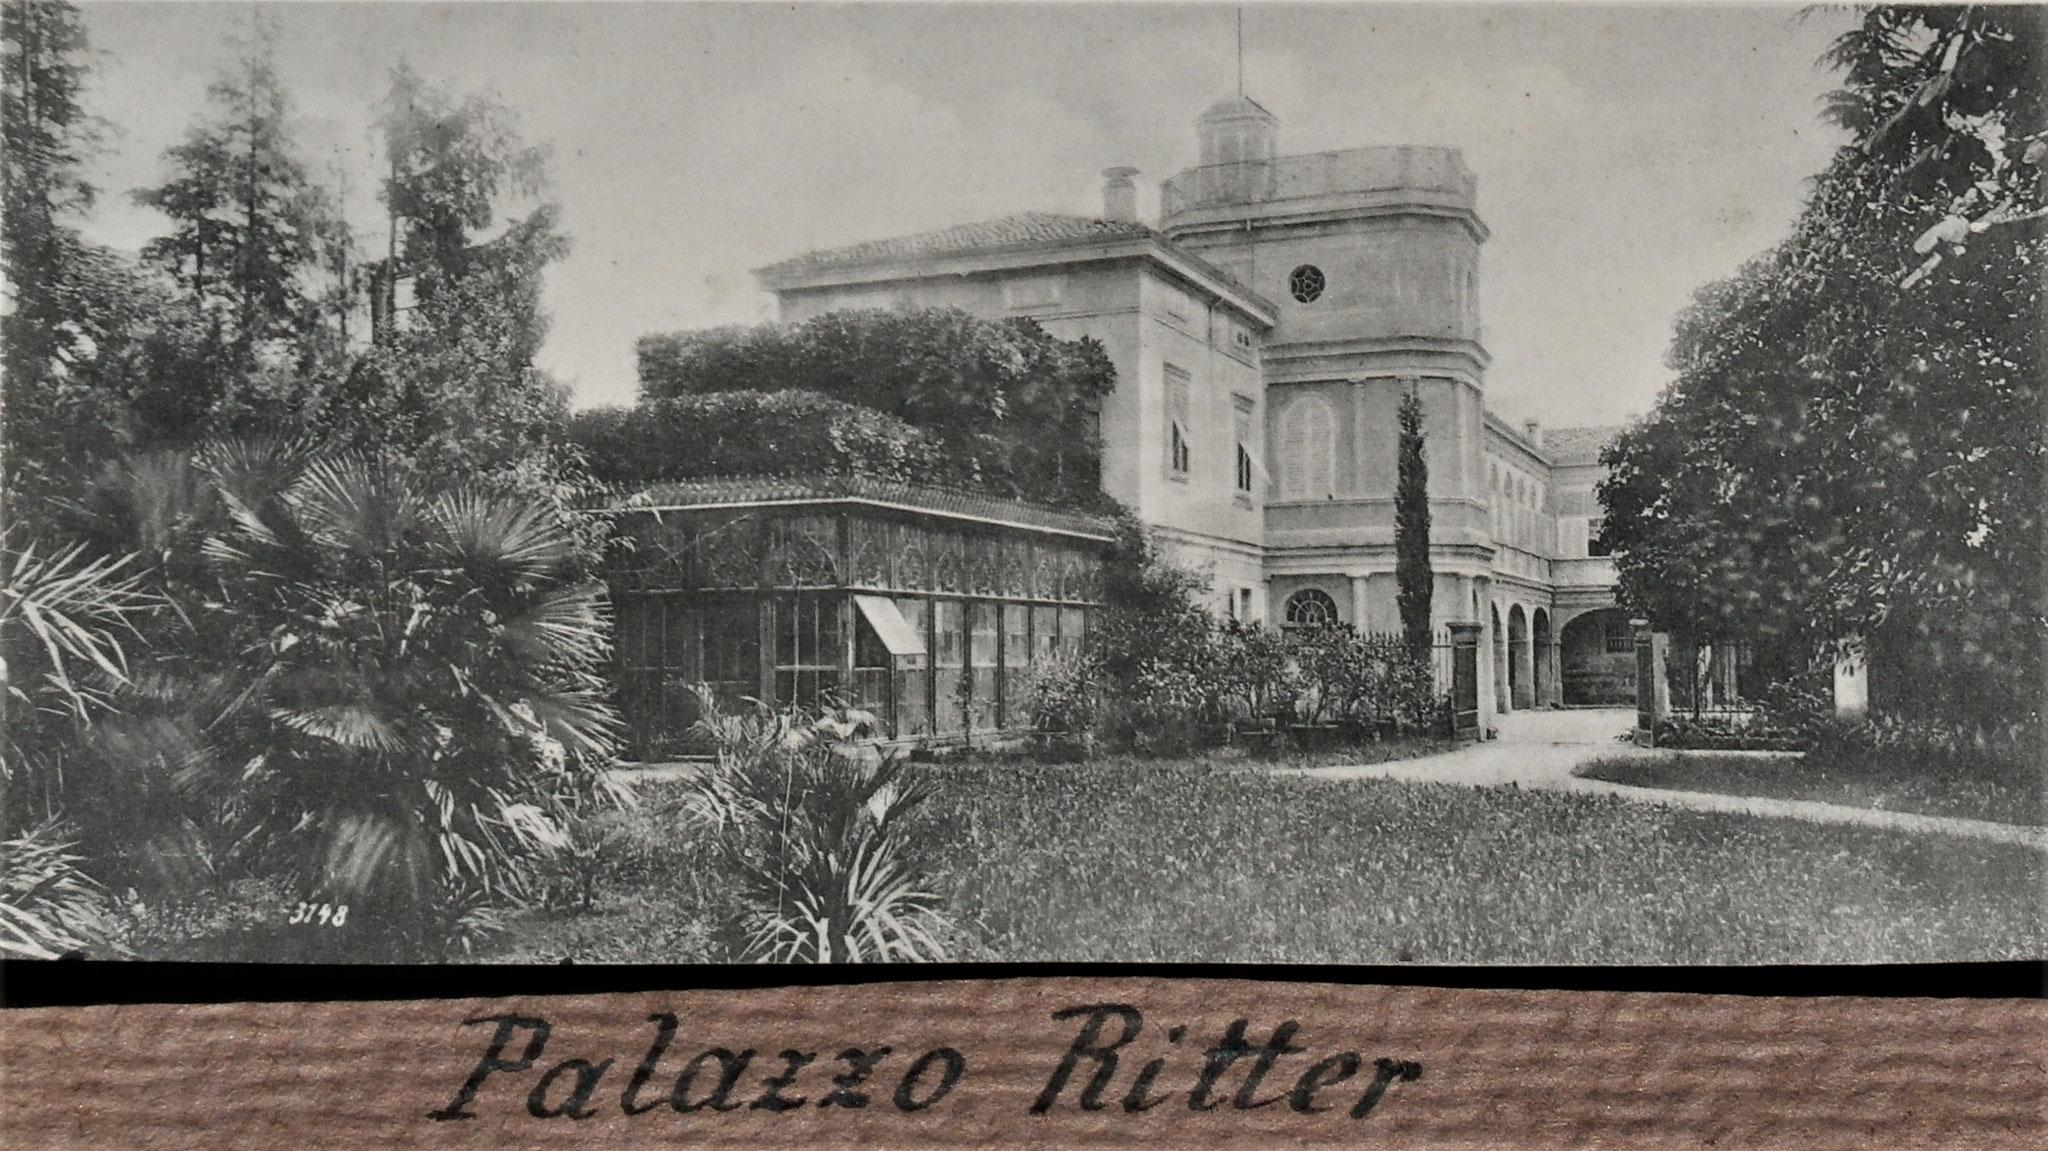 Palazzo Ritter